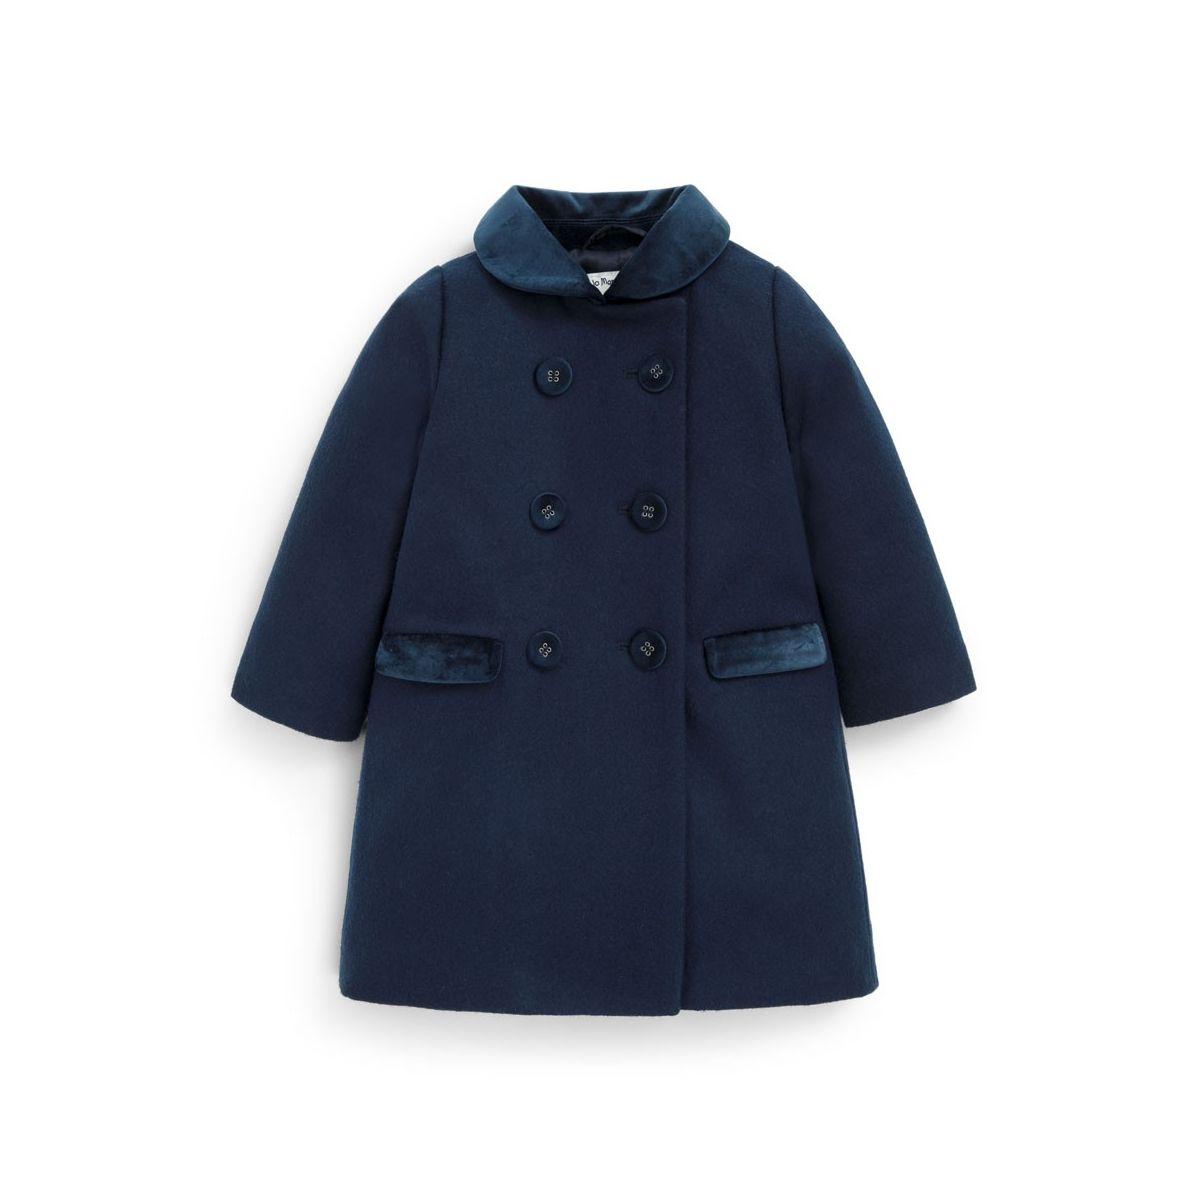 mejor selección de 2019 diseño innovador elegir original Abrigo Clásico Niño color Azul marino